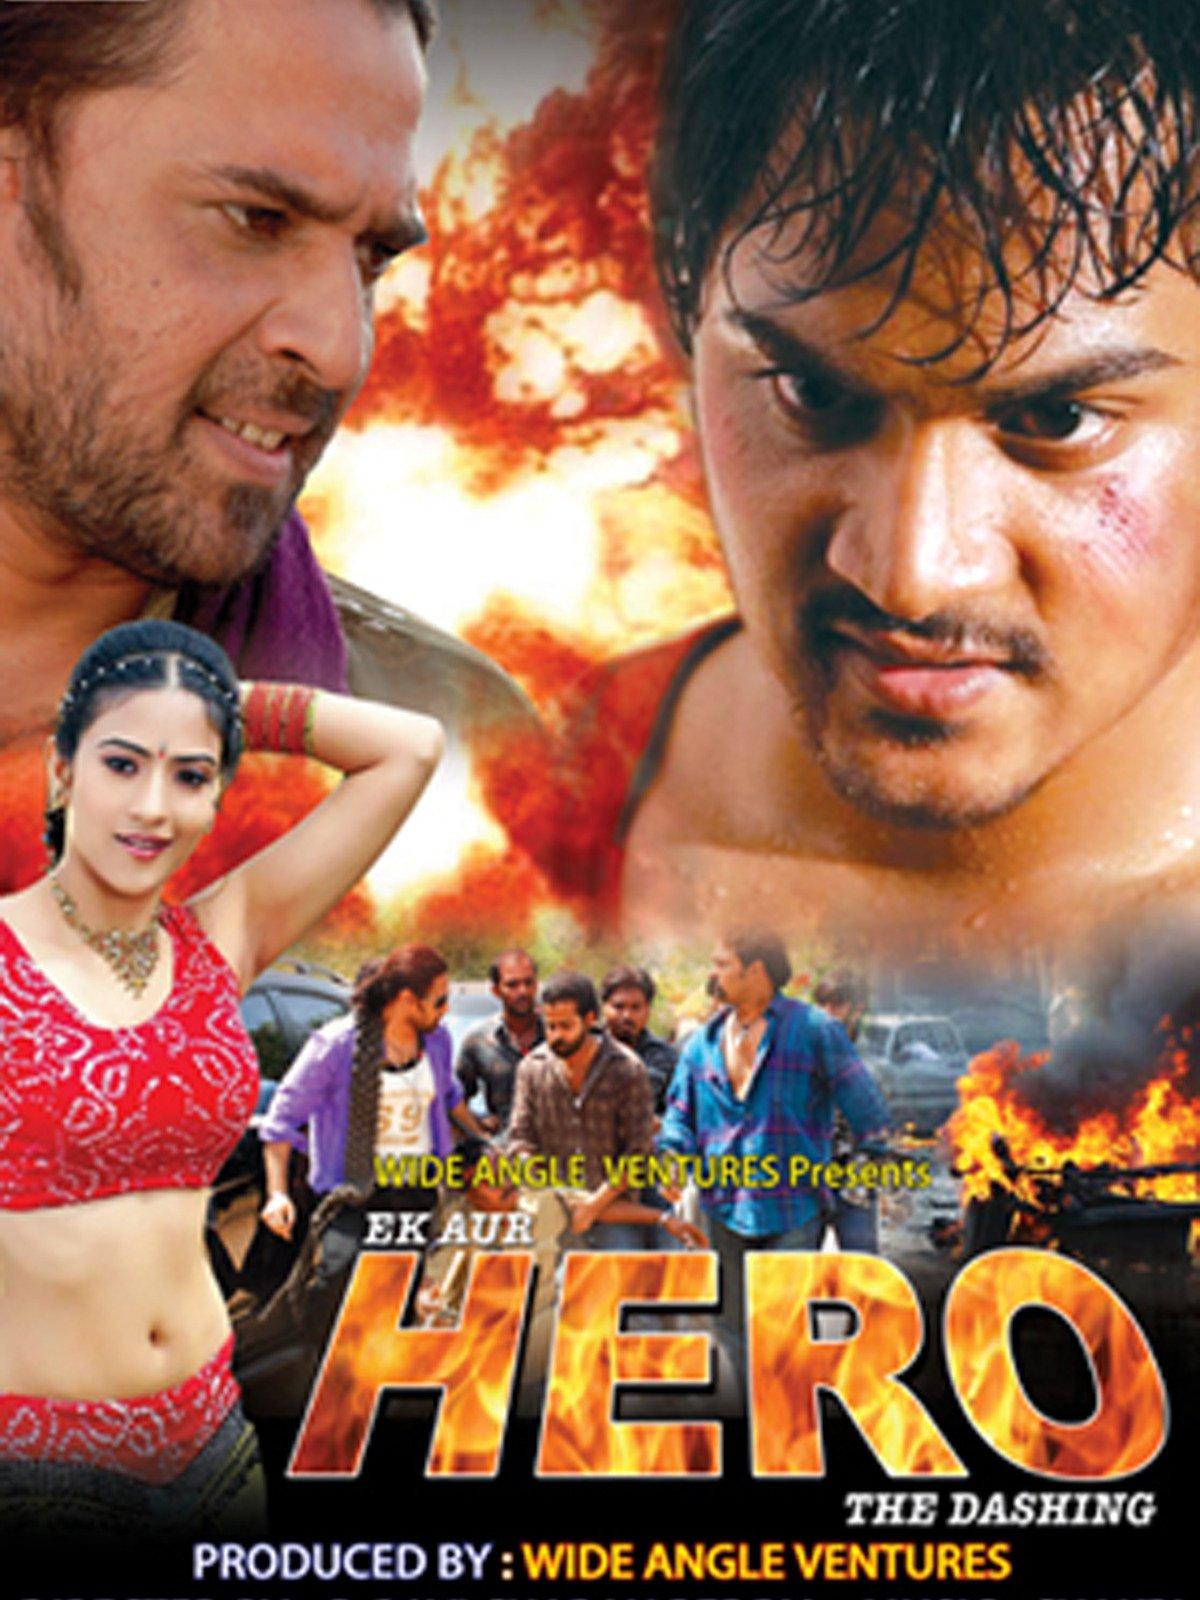 Ek Aur Hero The Dashing on Amazon Prime Video UK